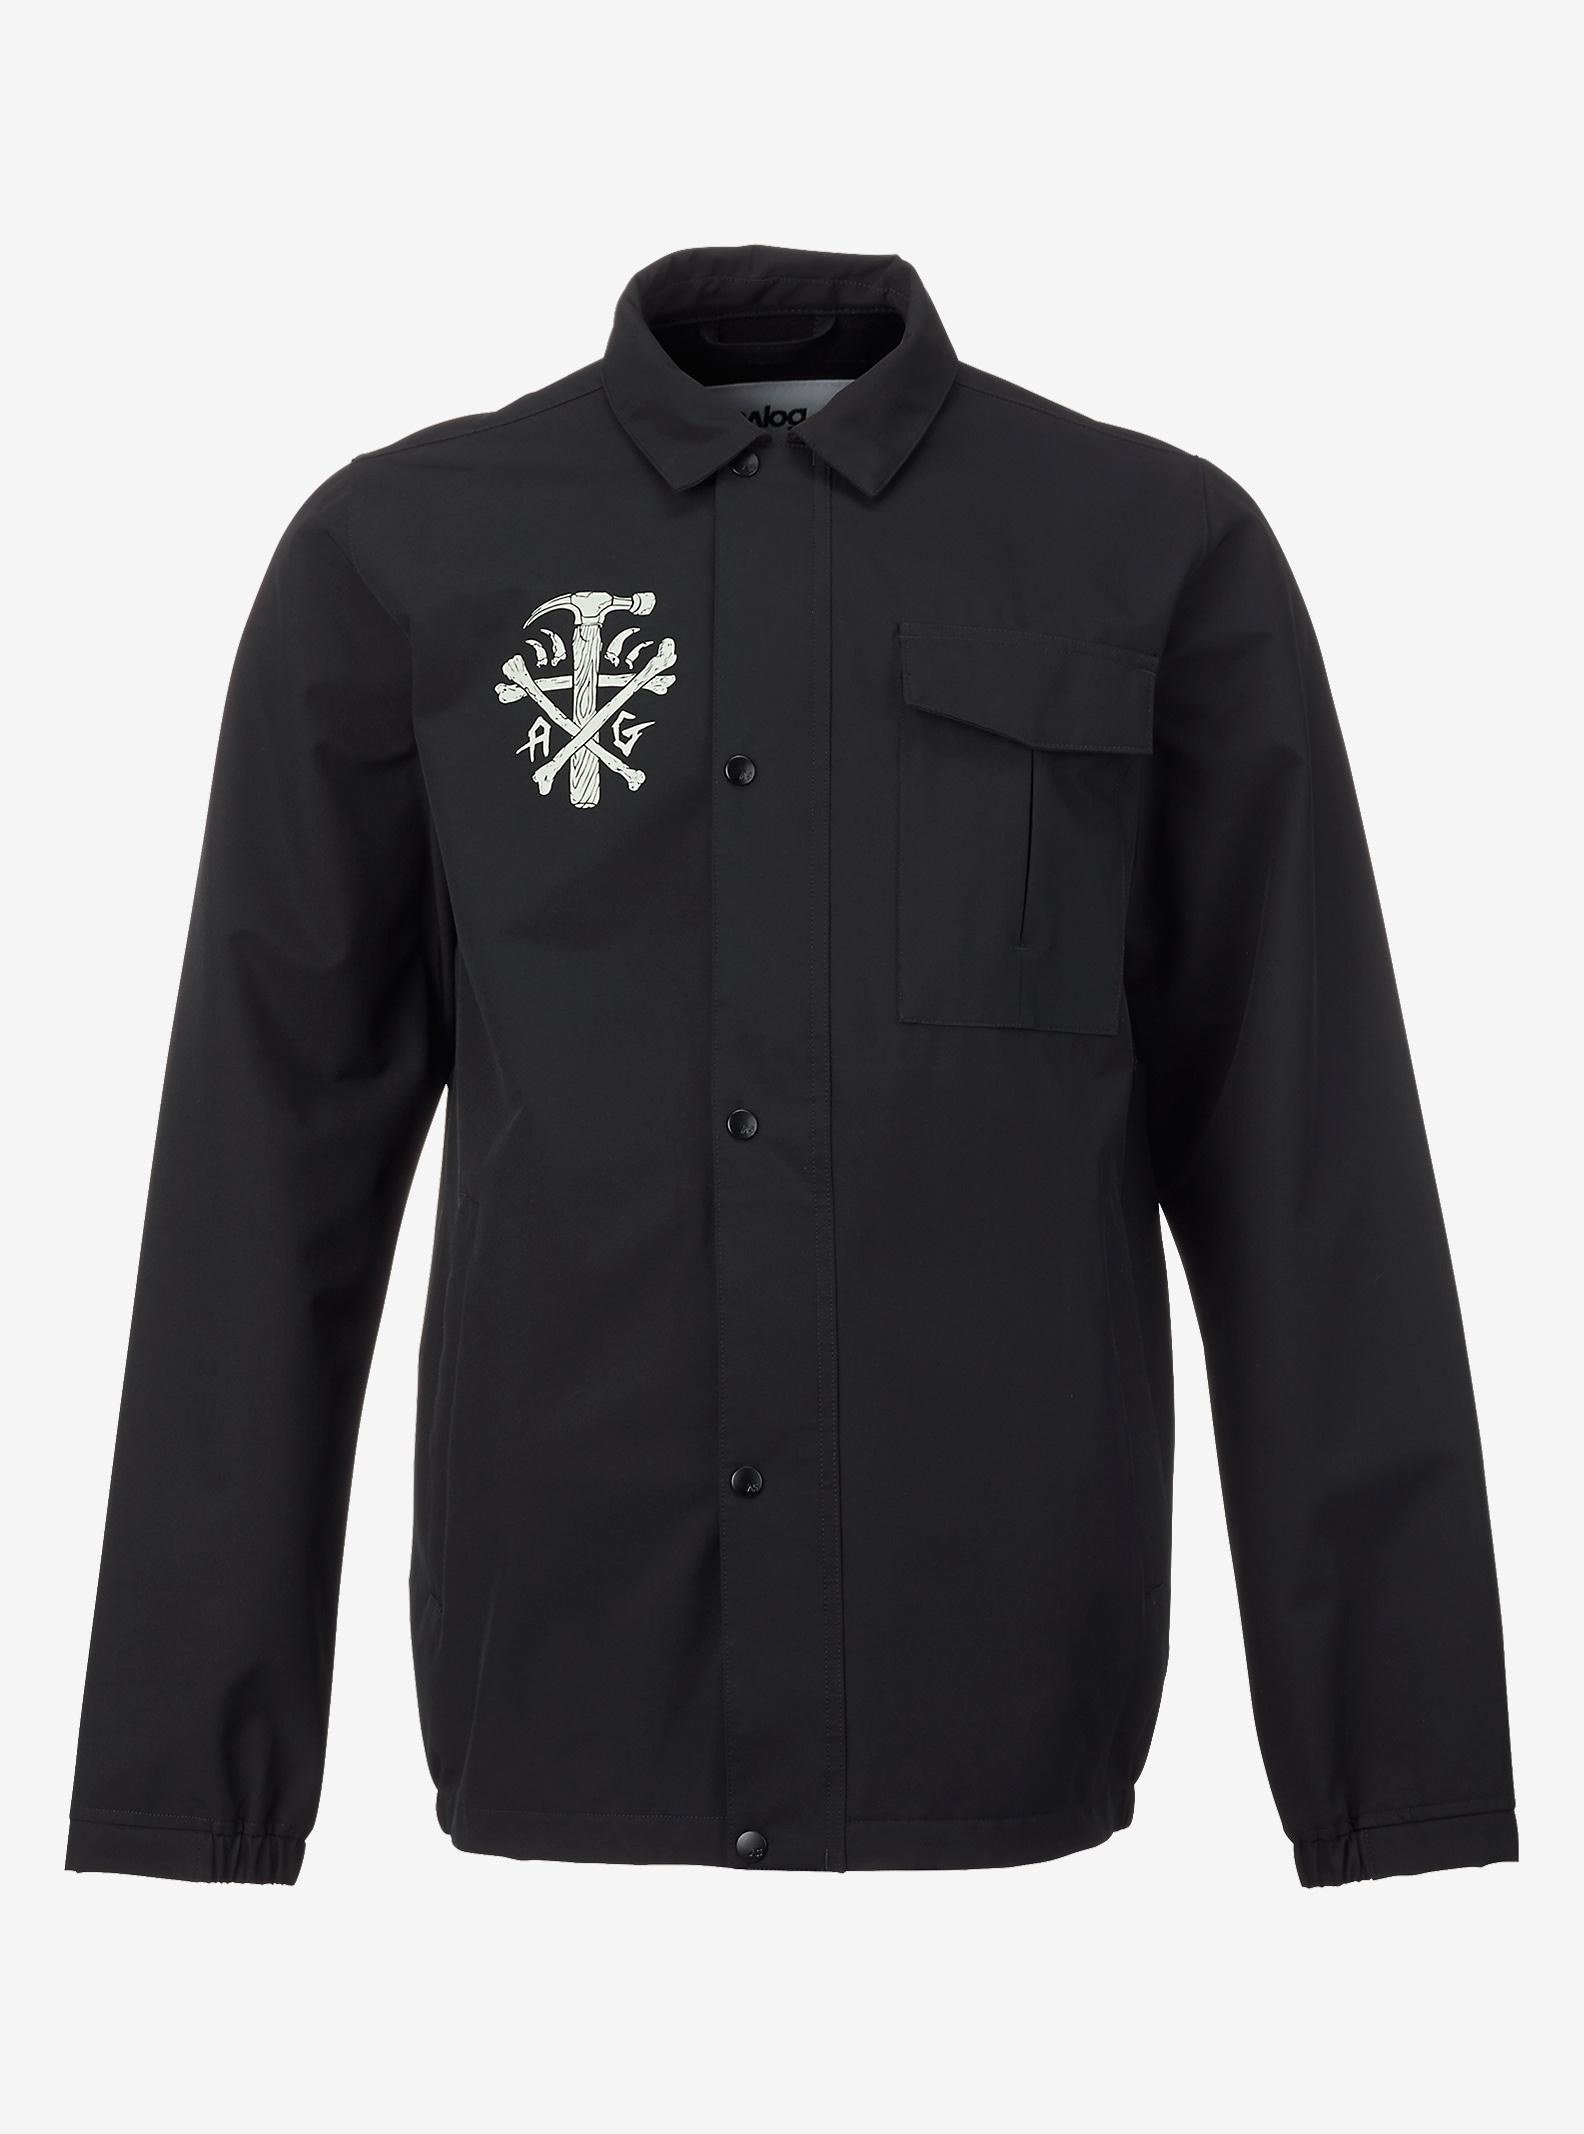 Analog 3LS Foxhole Jacket shown in True Black